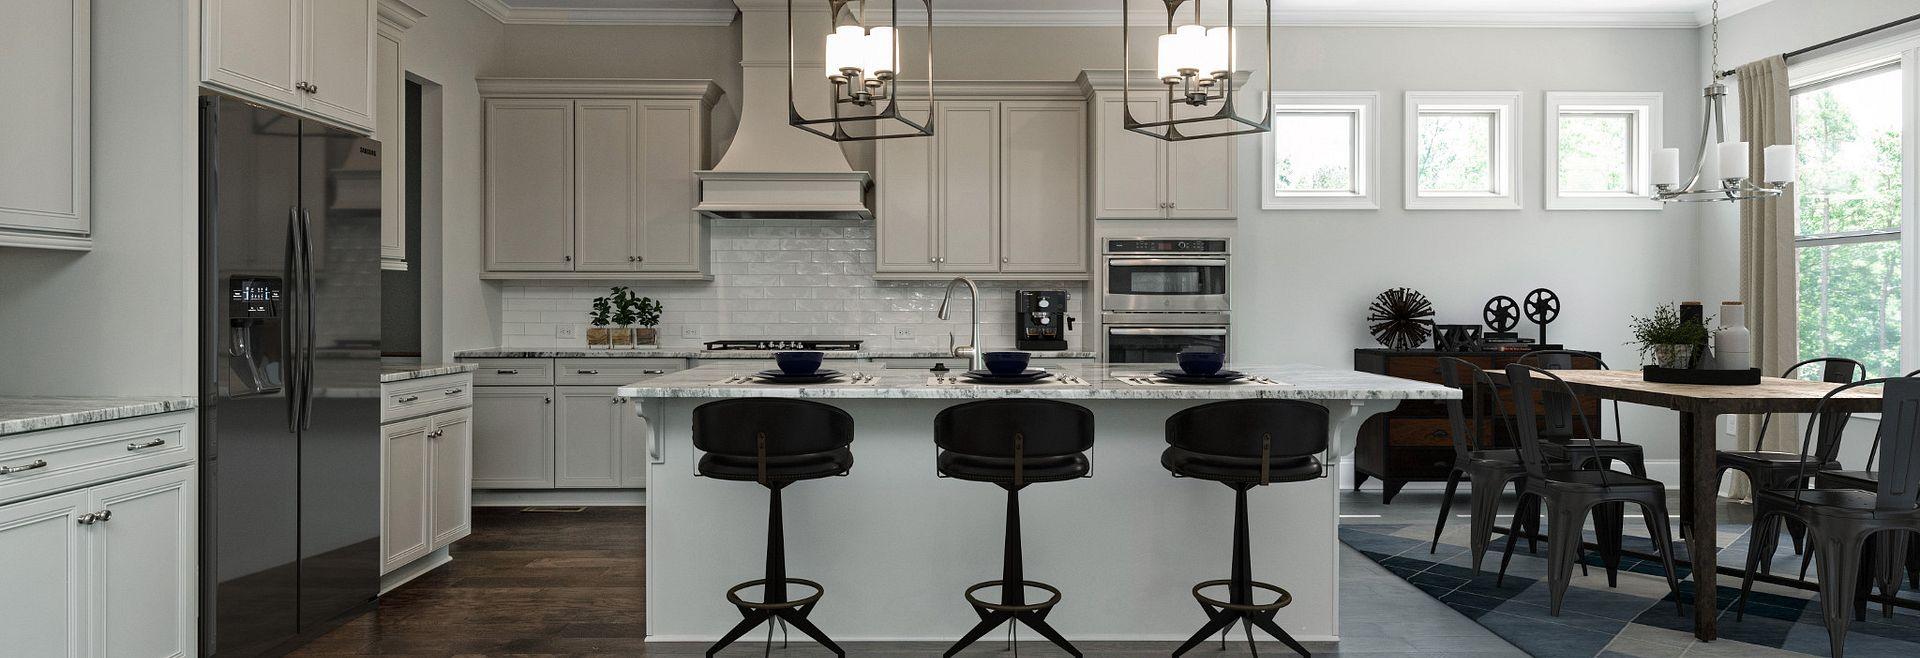 Magnolia plan Kitchen & Breakfast Room